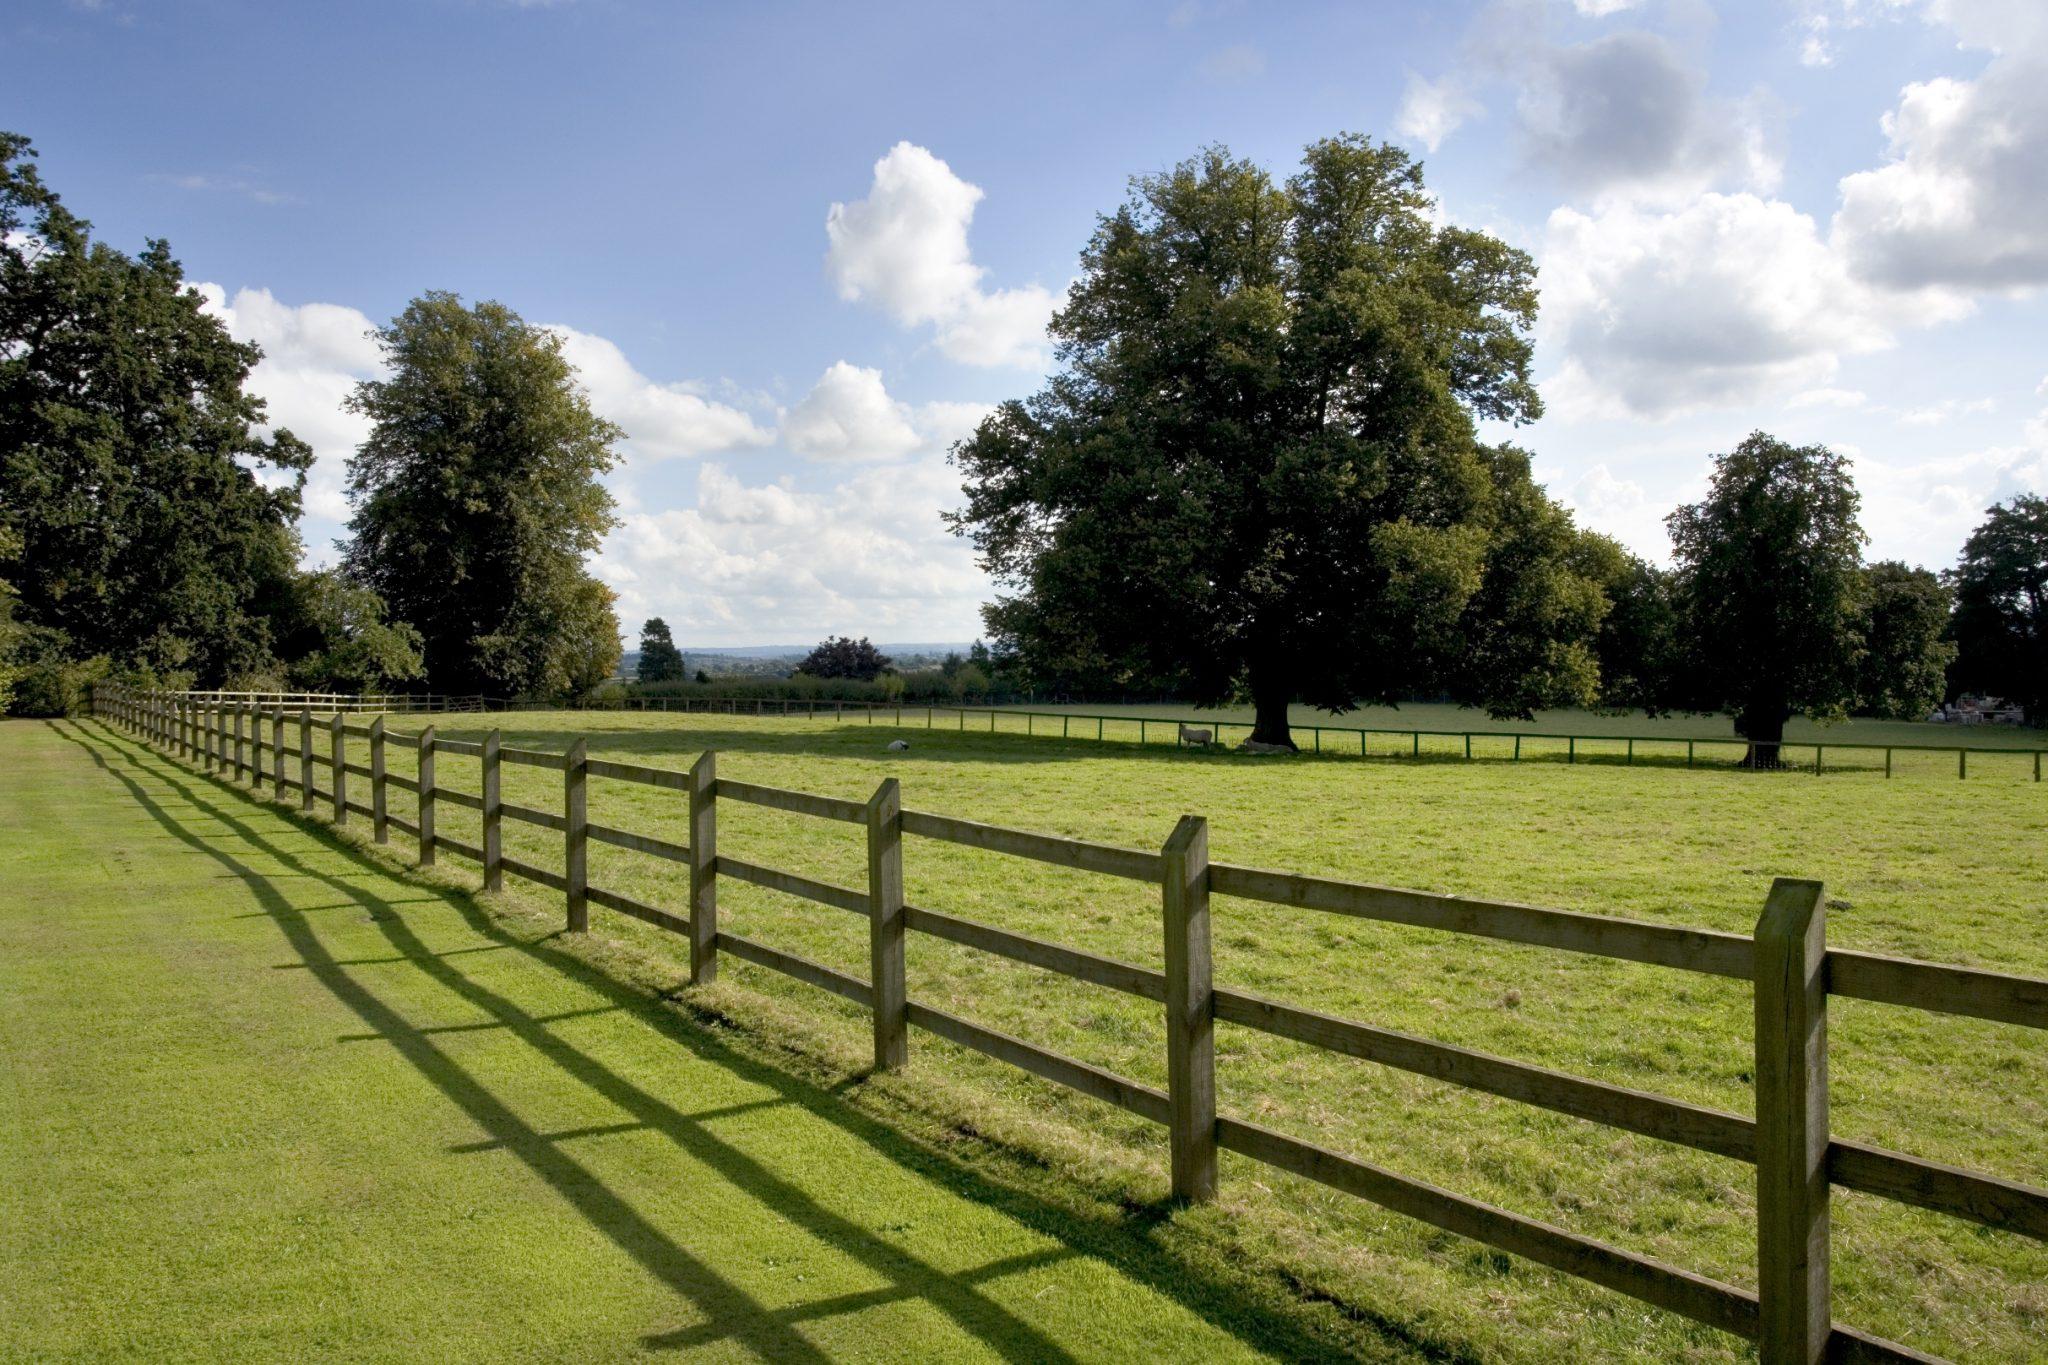 fence around field image